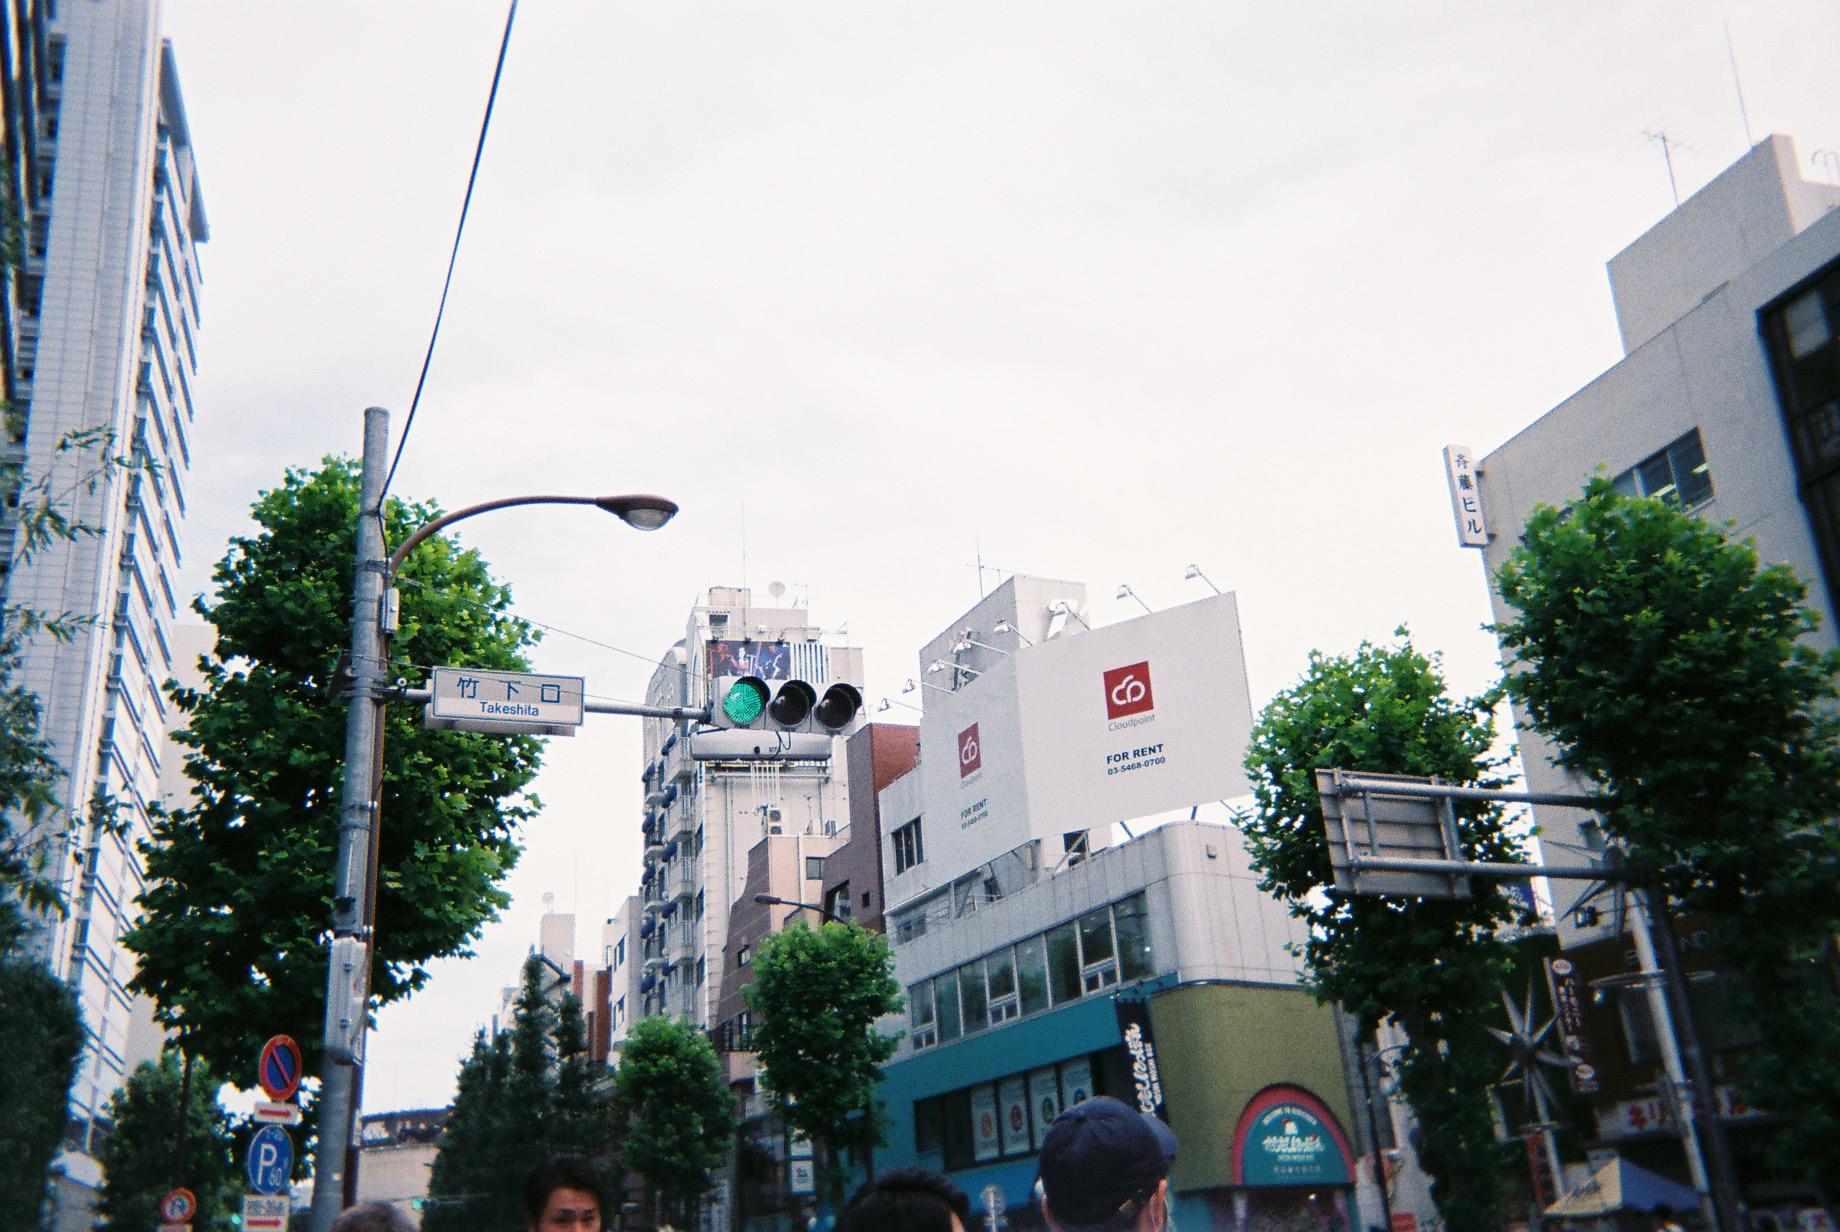 https://www.machikado-creative.jp/wordpress/wp-content/uploads/2017/09/FH010018.jpg